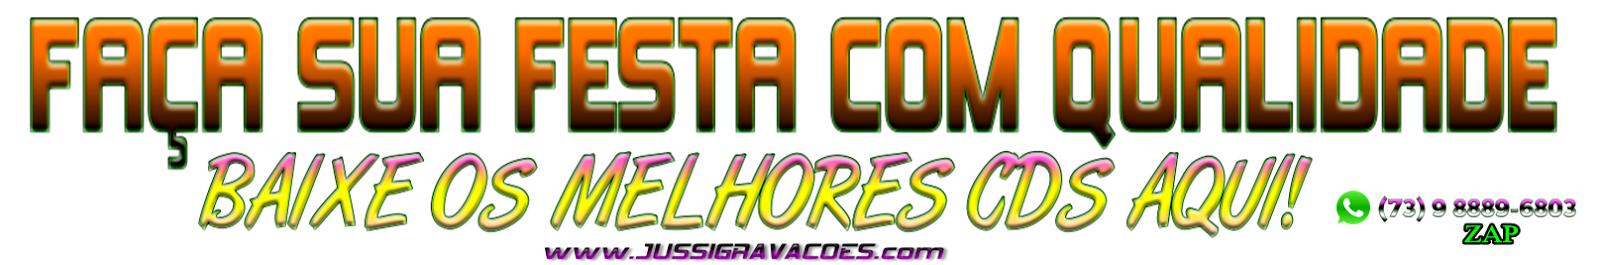 www.JUSSIGRAVACOES.com